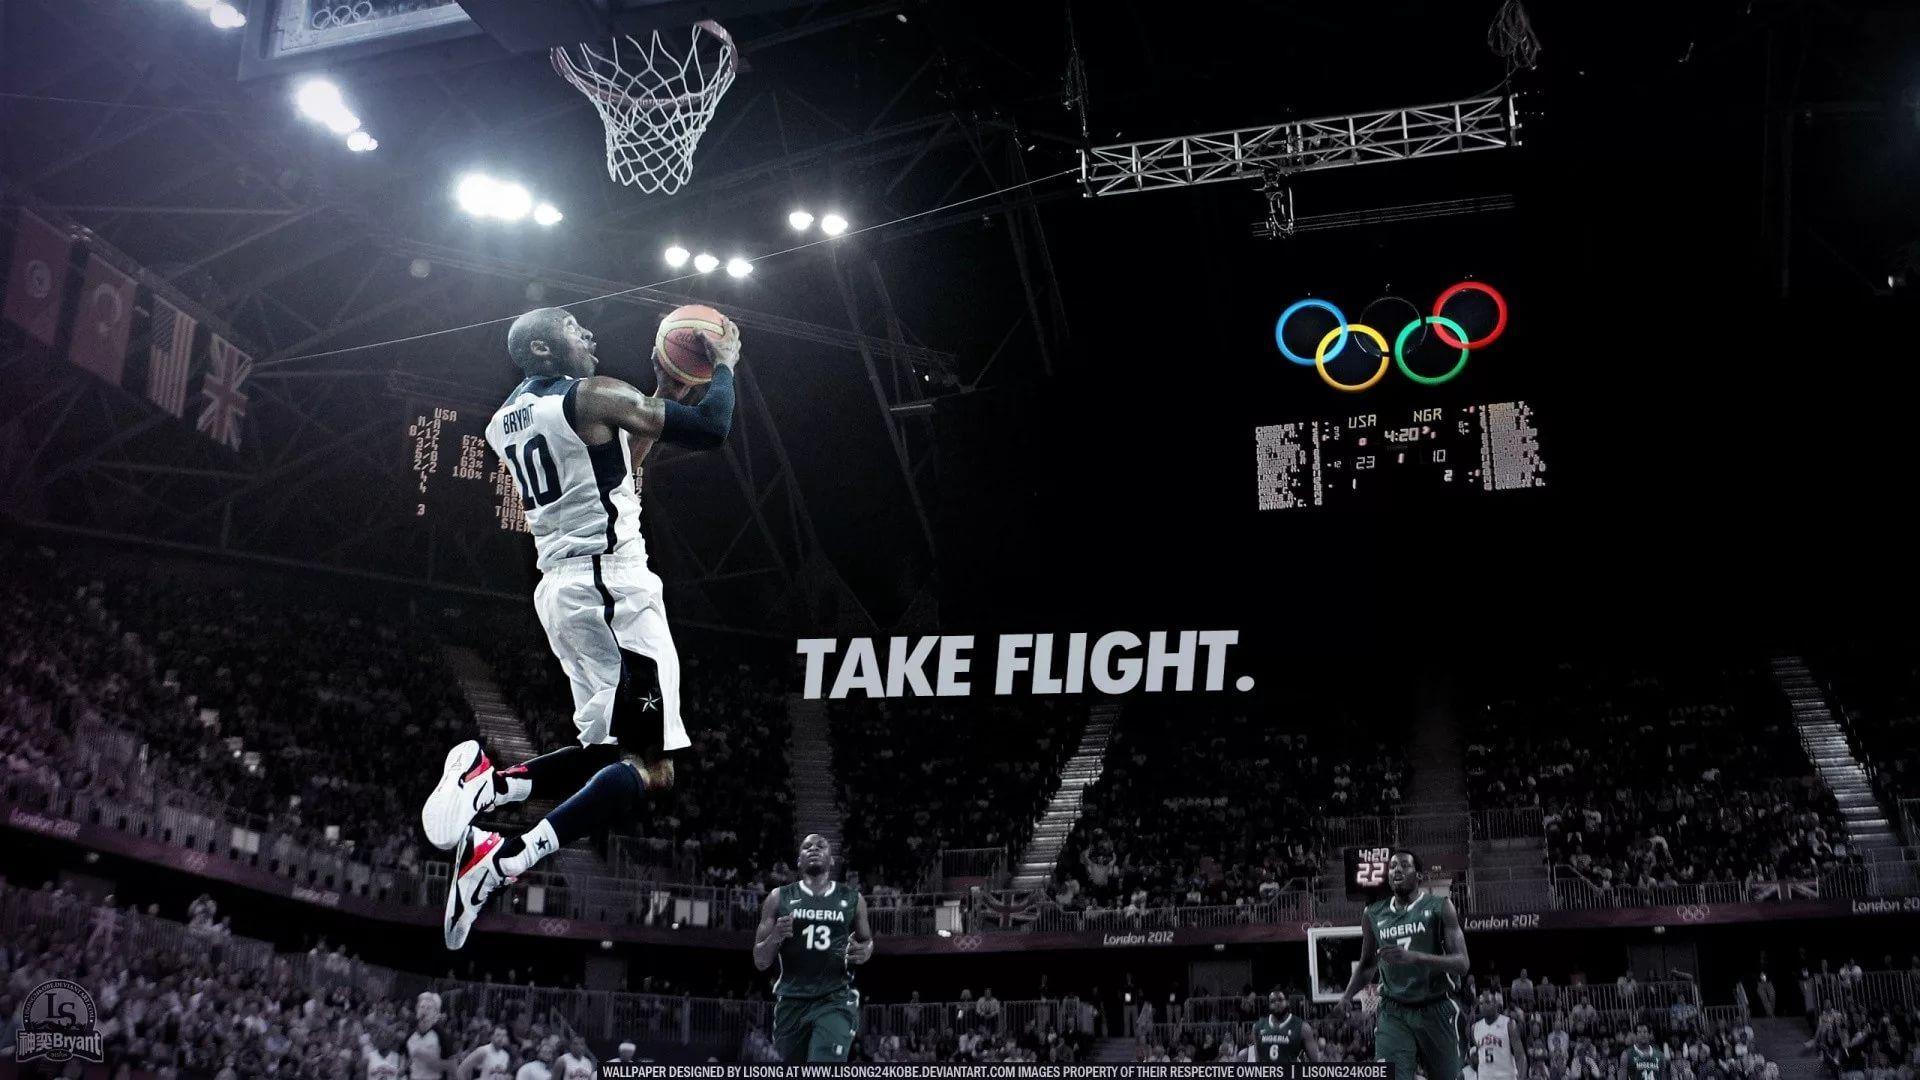 Nike Basketball download wallpaper image